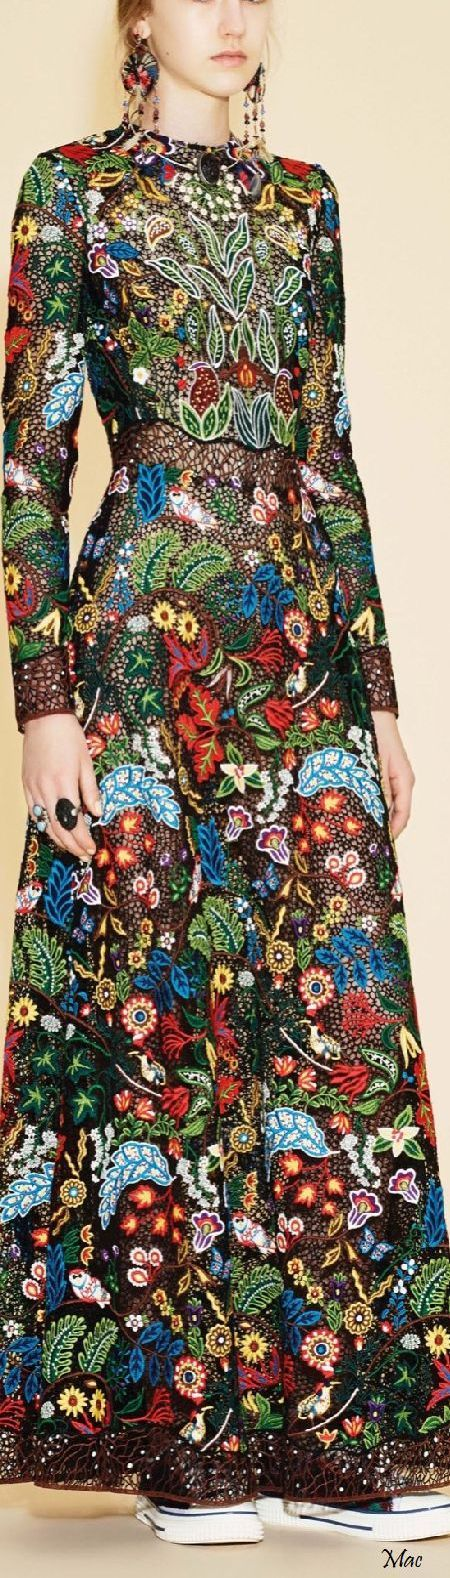 @geralkeysFall/Winter 2016 | Vestido Valentino, alta costura. www.facebook.com/... #vestidos #dress #valentino